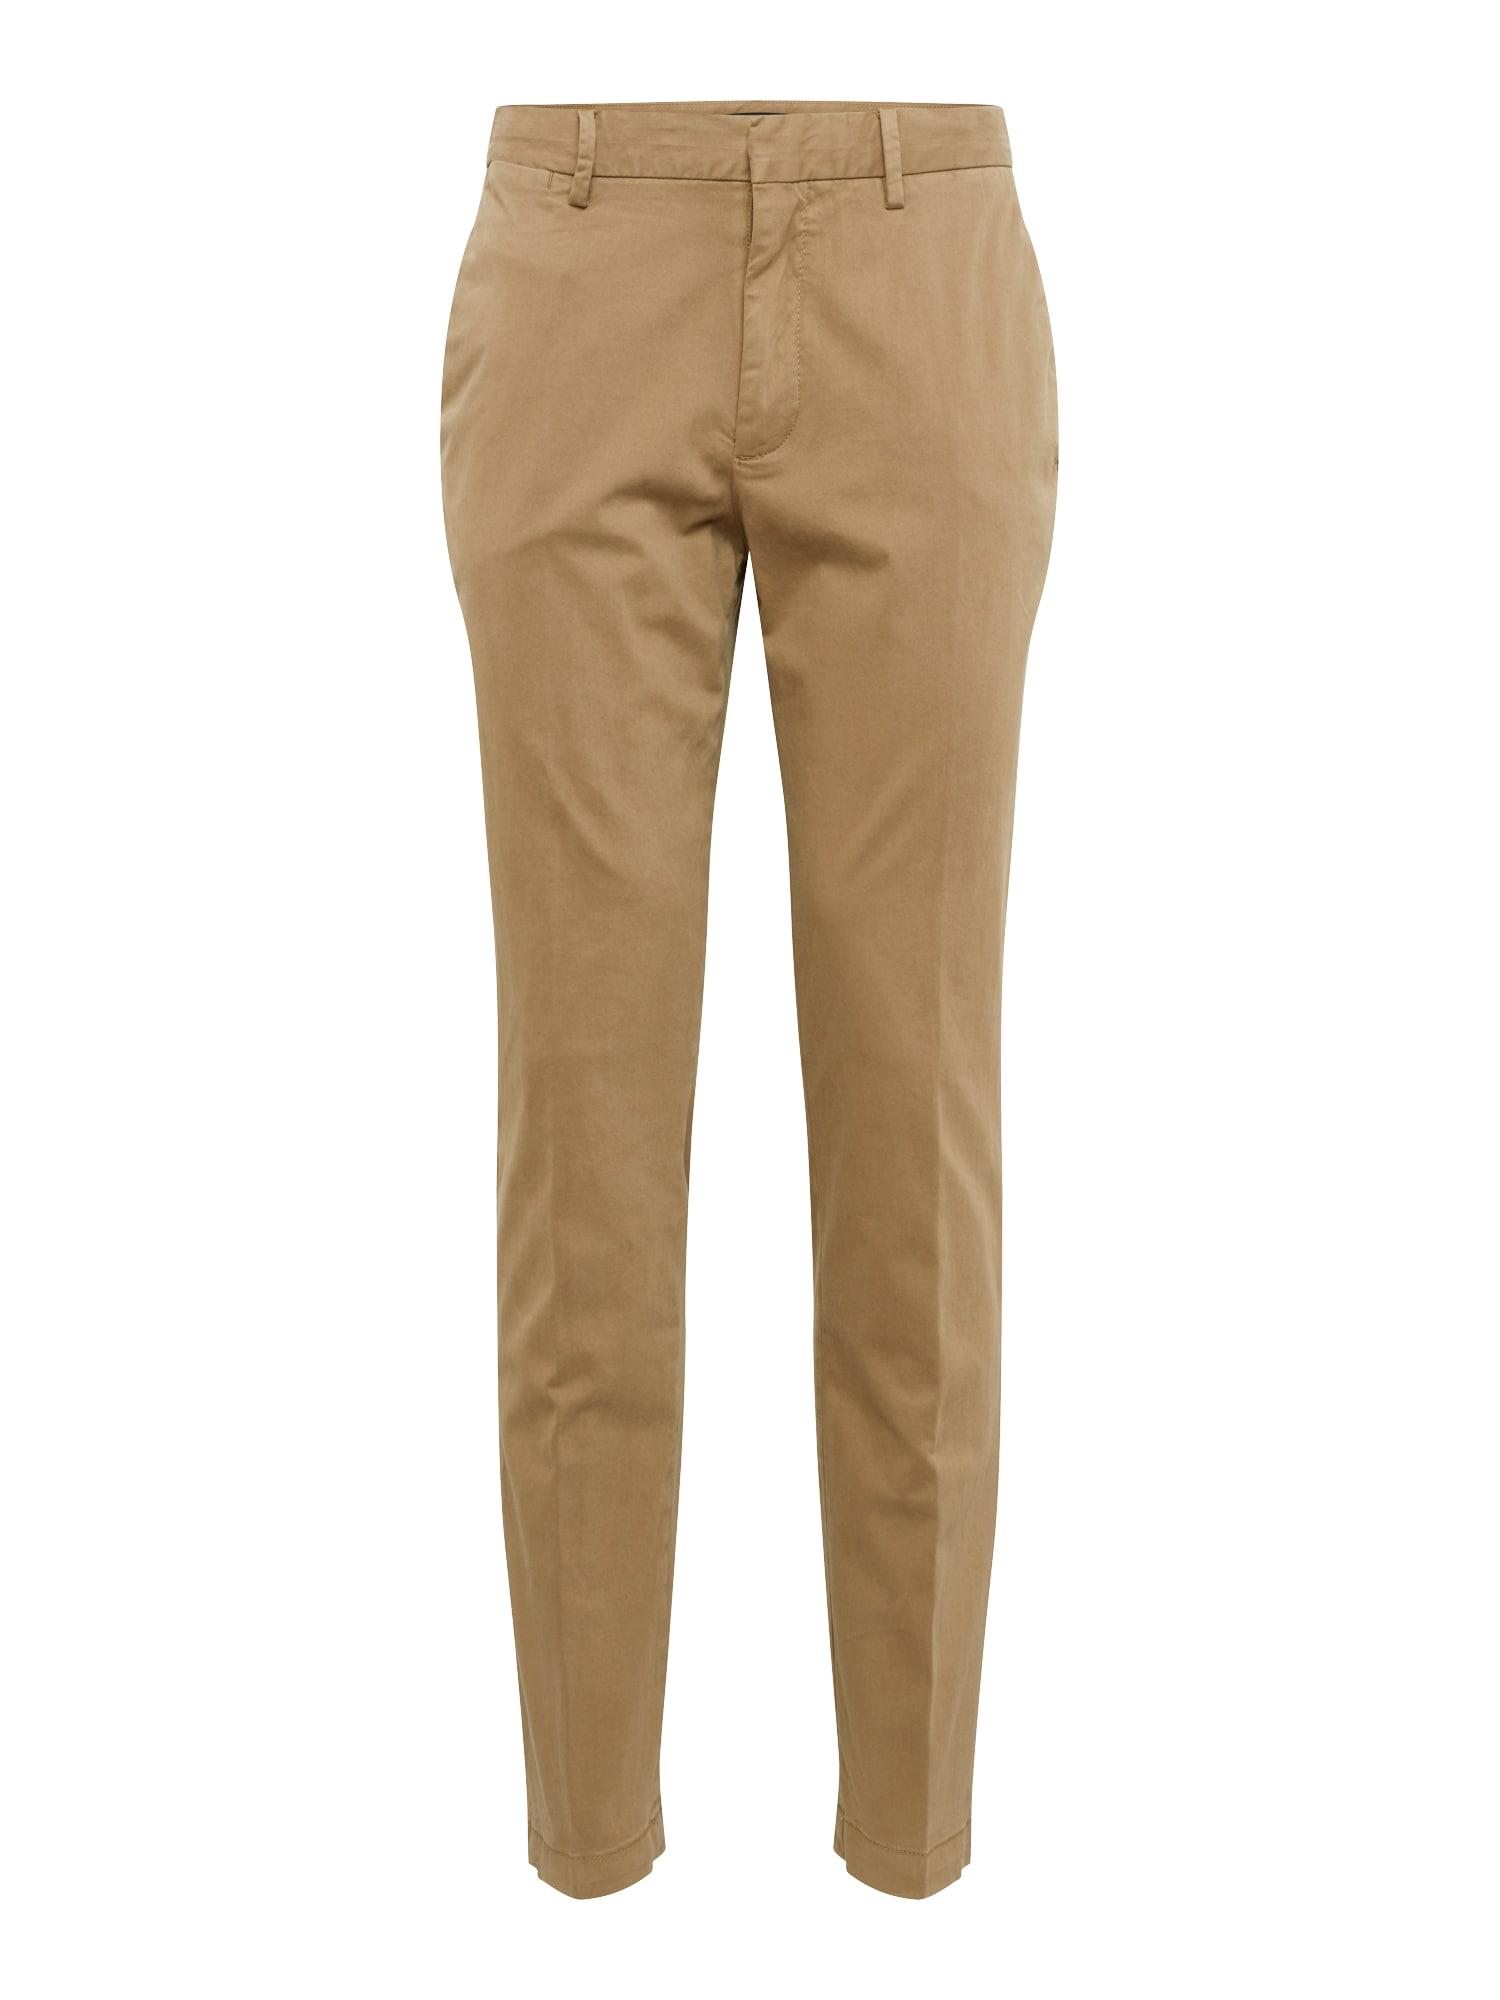 Chino kalhoty SLIM AUTHENTIC tmavě béžová Banana Republic